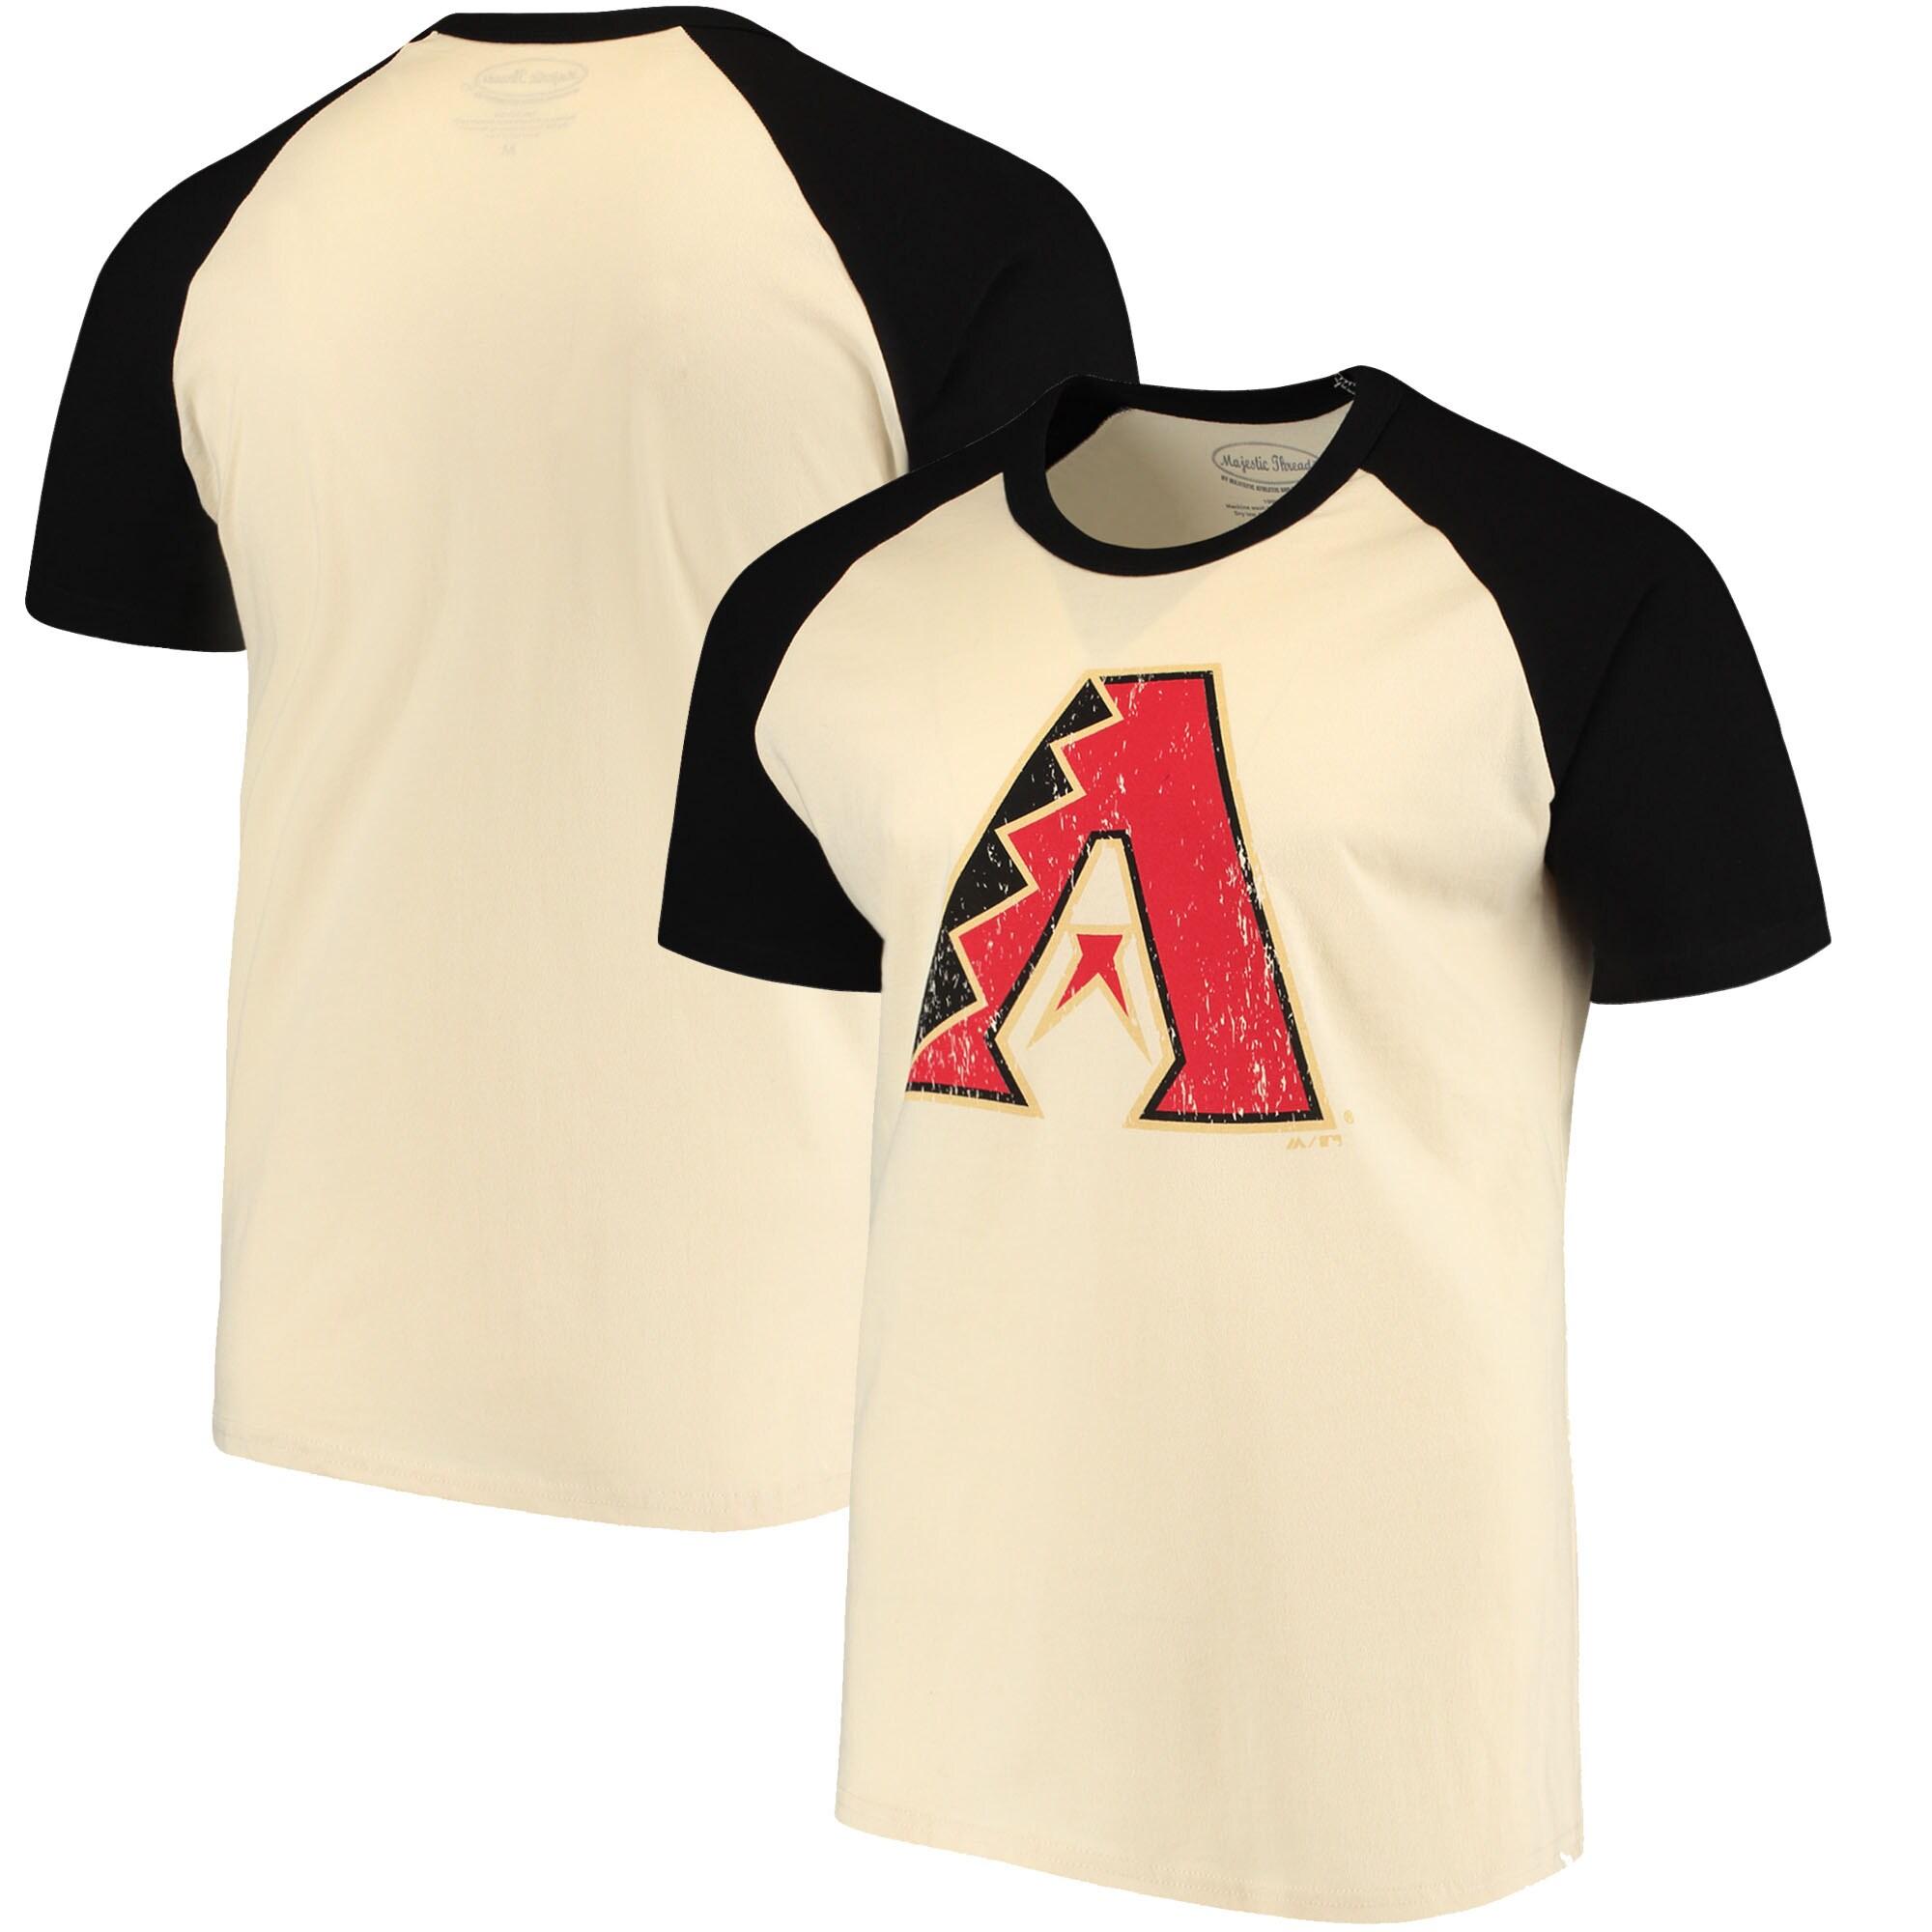 Arizona Diamondbacks Majestic Threads Softhand Raglan T-Shirt - Cream/Black